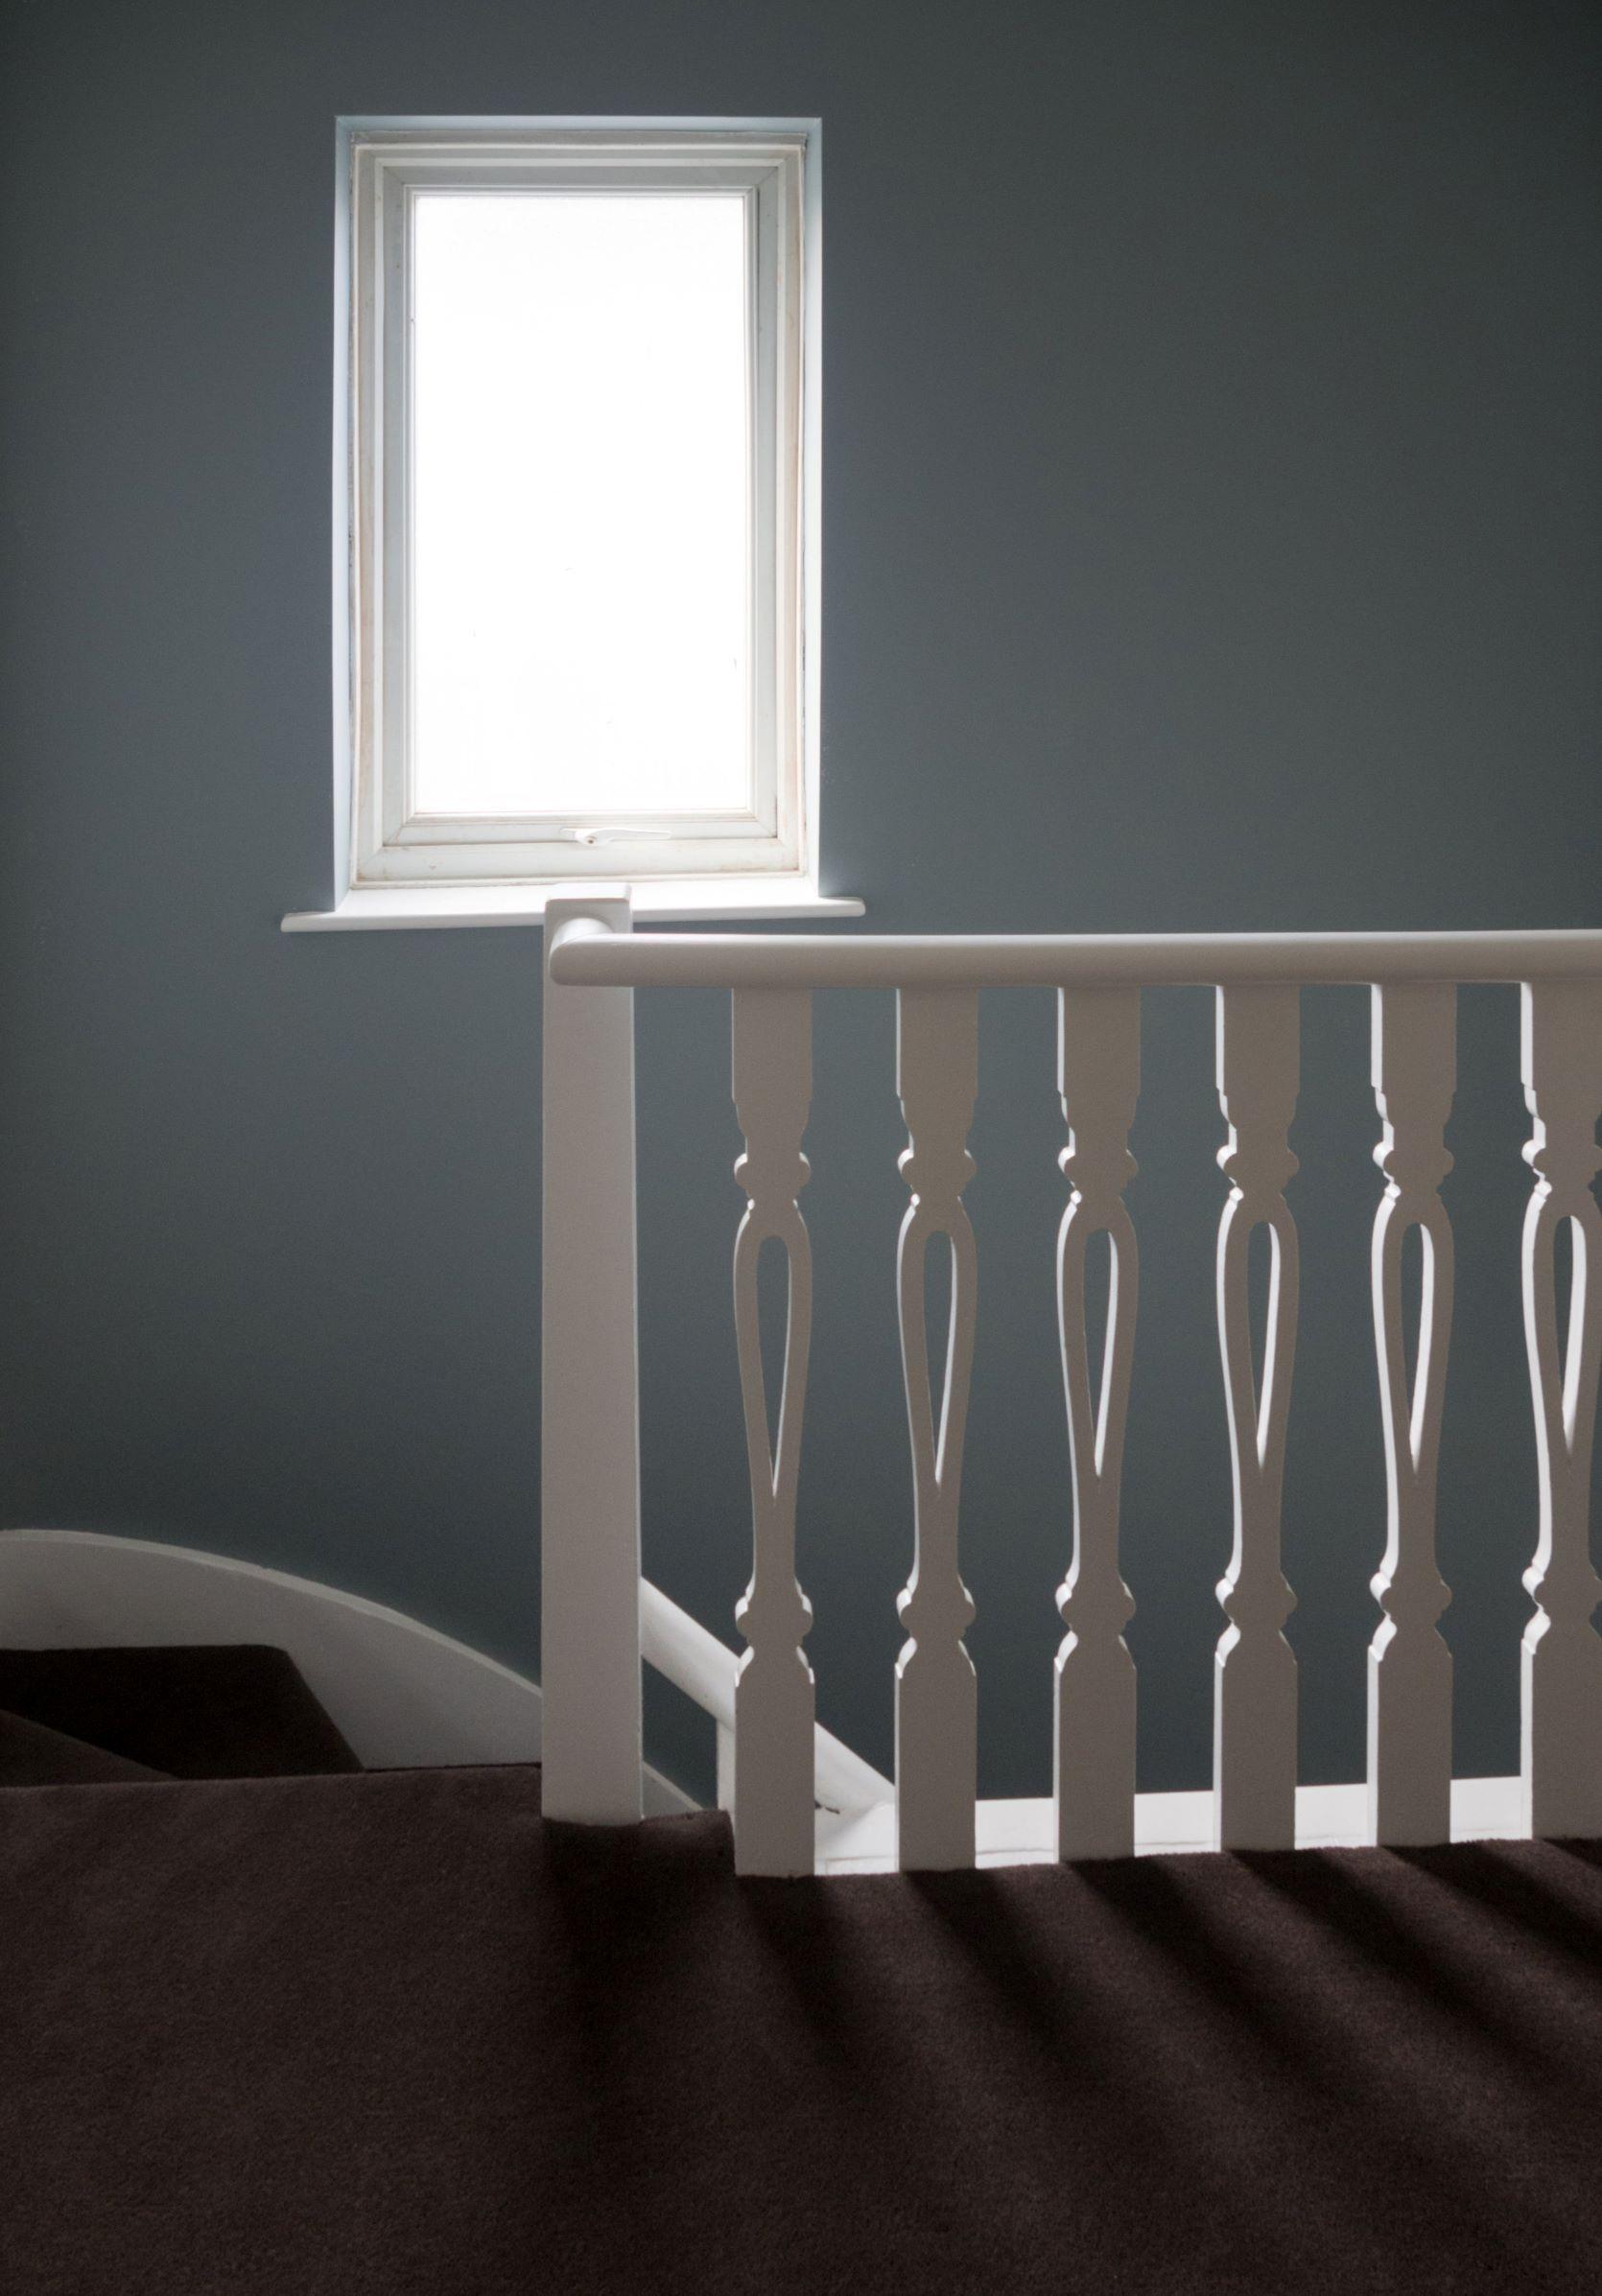 Wooden Stair Balustrade